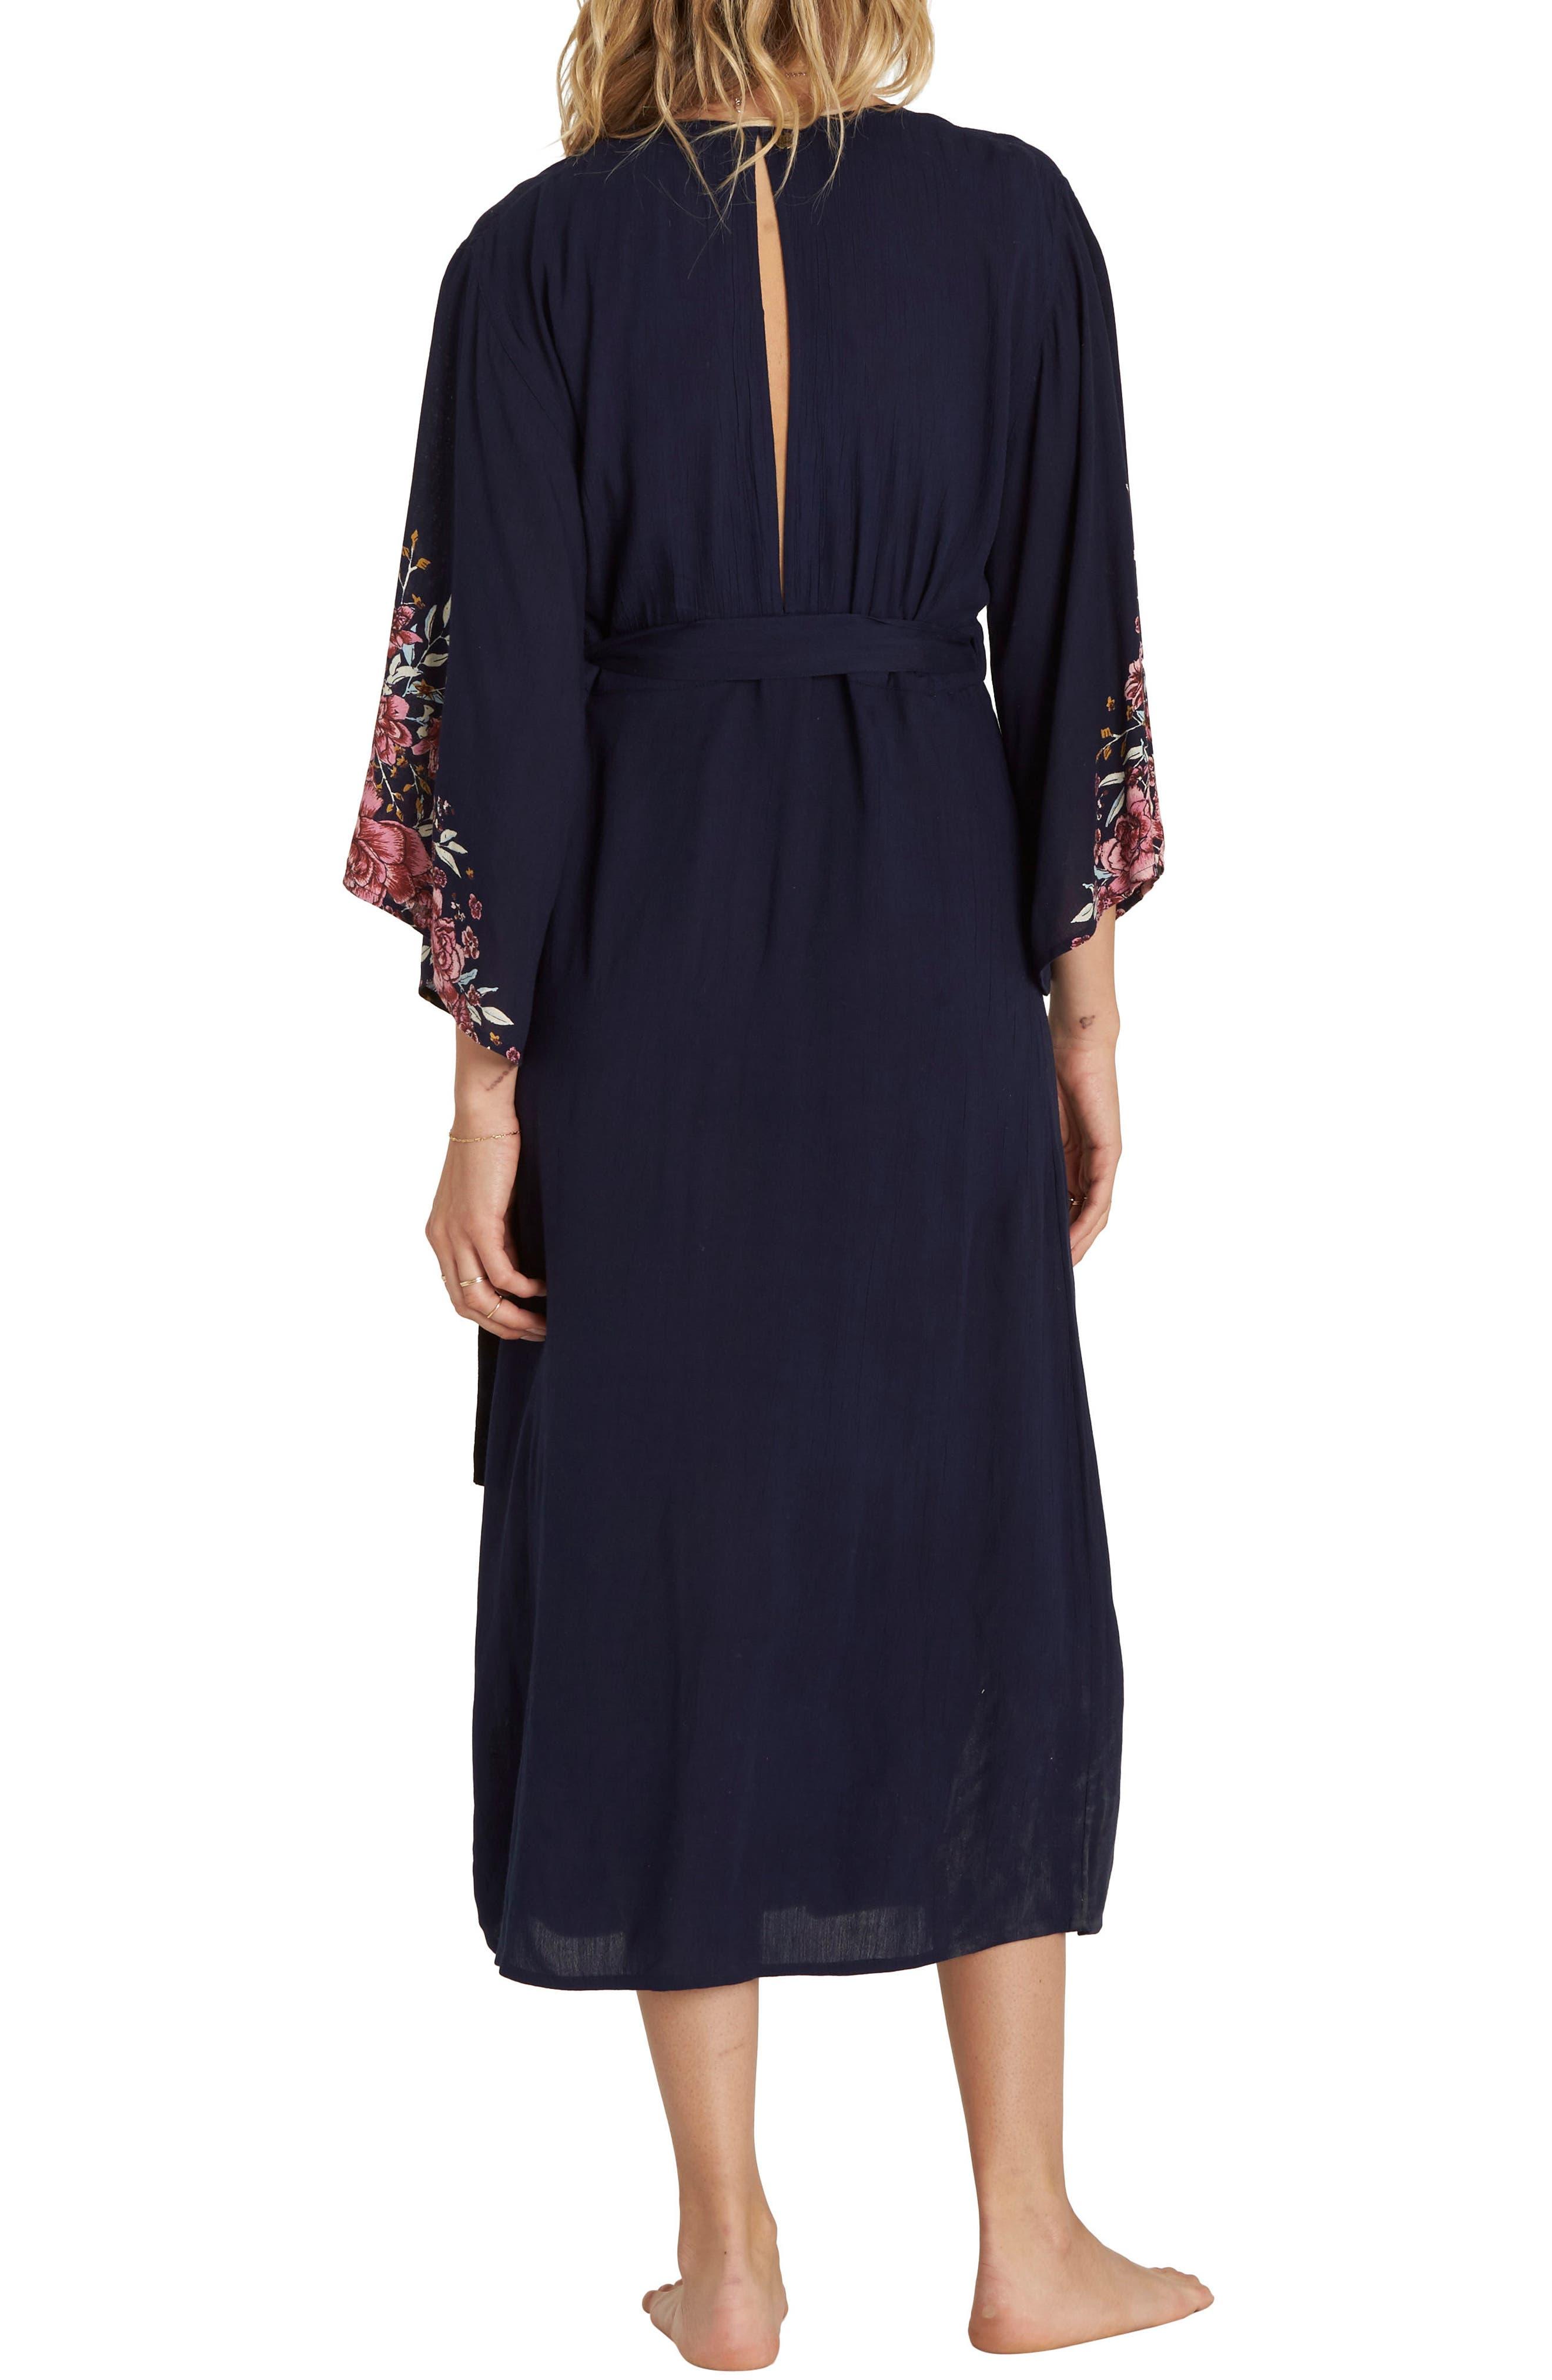 Robe Life Midi Dress,                             Alternate thumbnail 2, color,                             Deep Sea